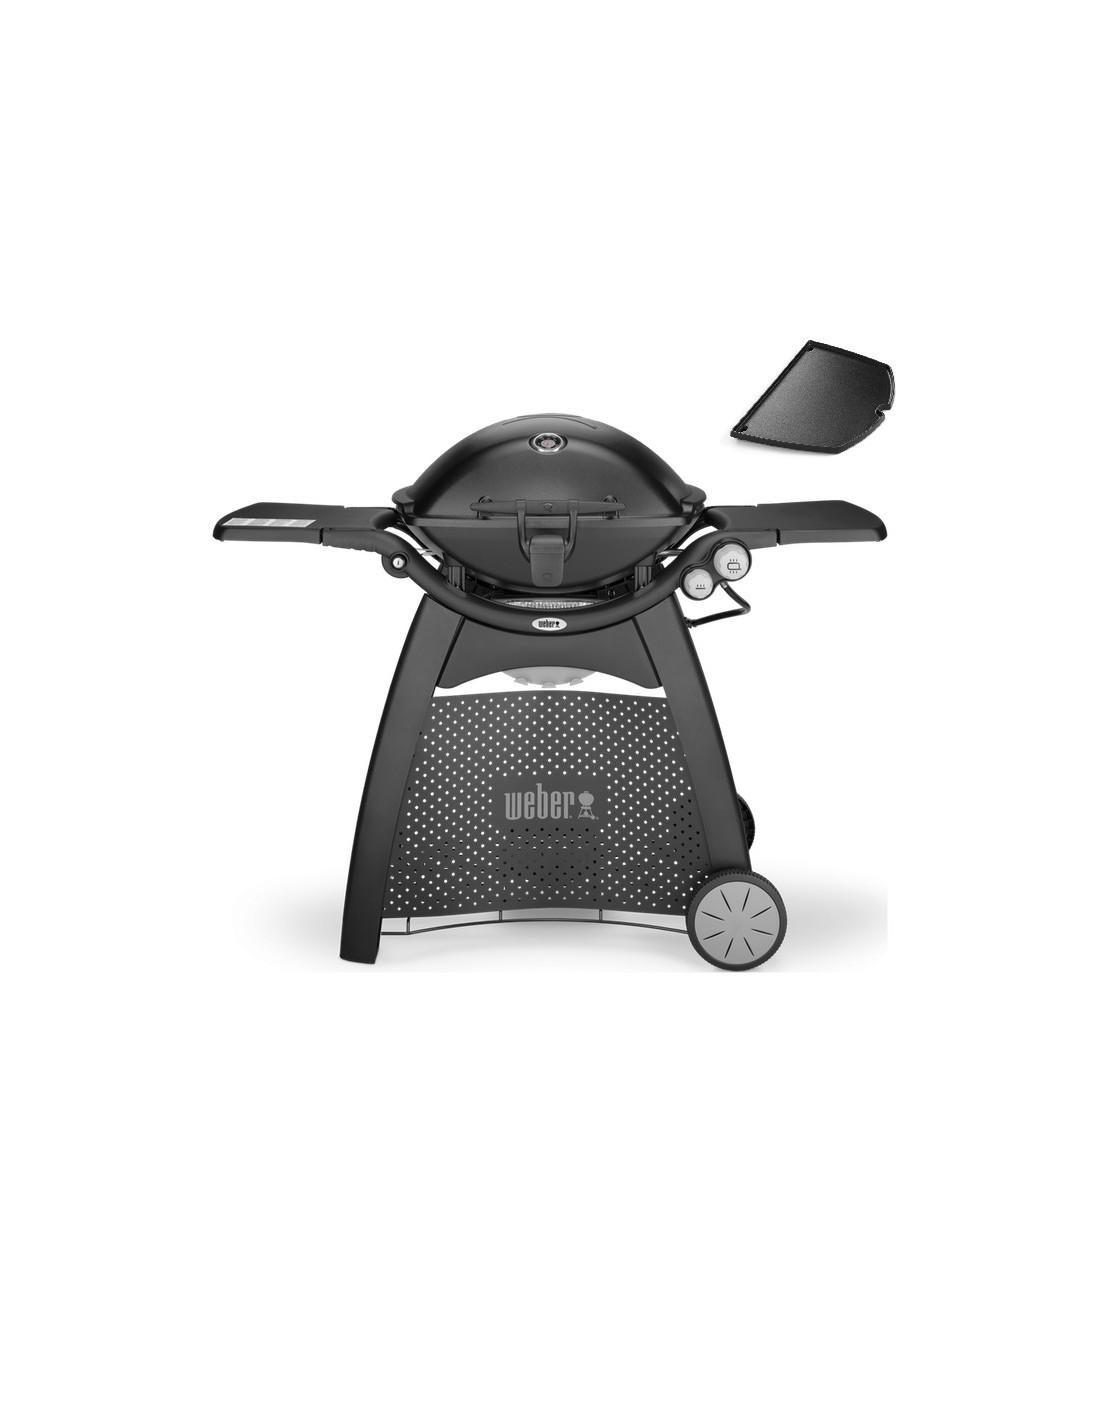 barbecue gaz q3200 black noir avec chariot et plancha weber. Black Bedroom Furniture Sets. Home Design Ideas